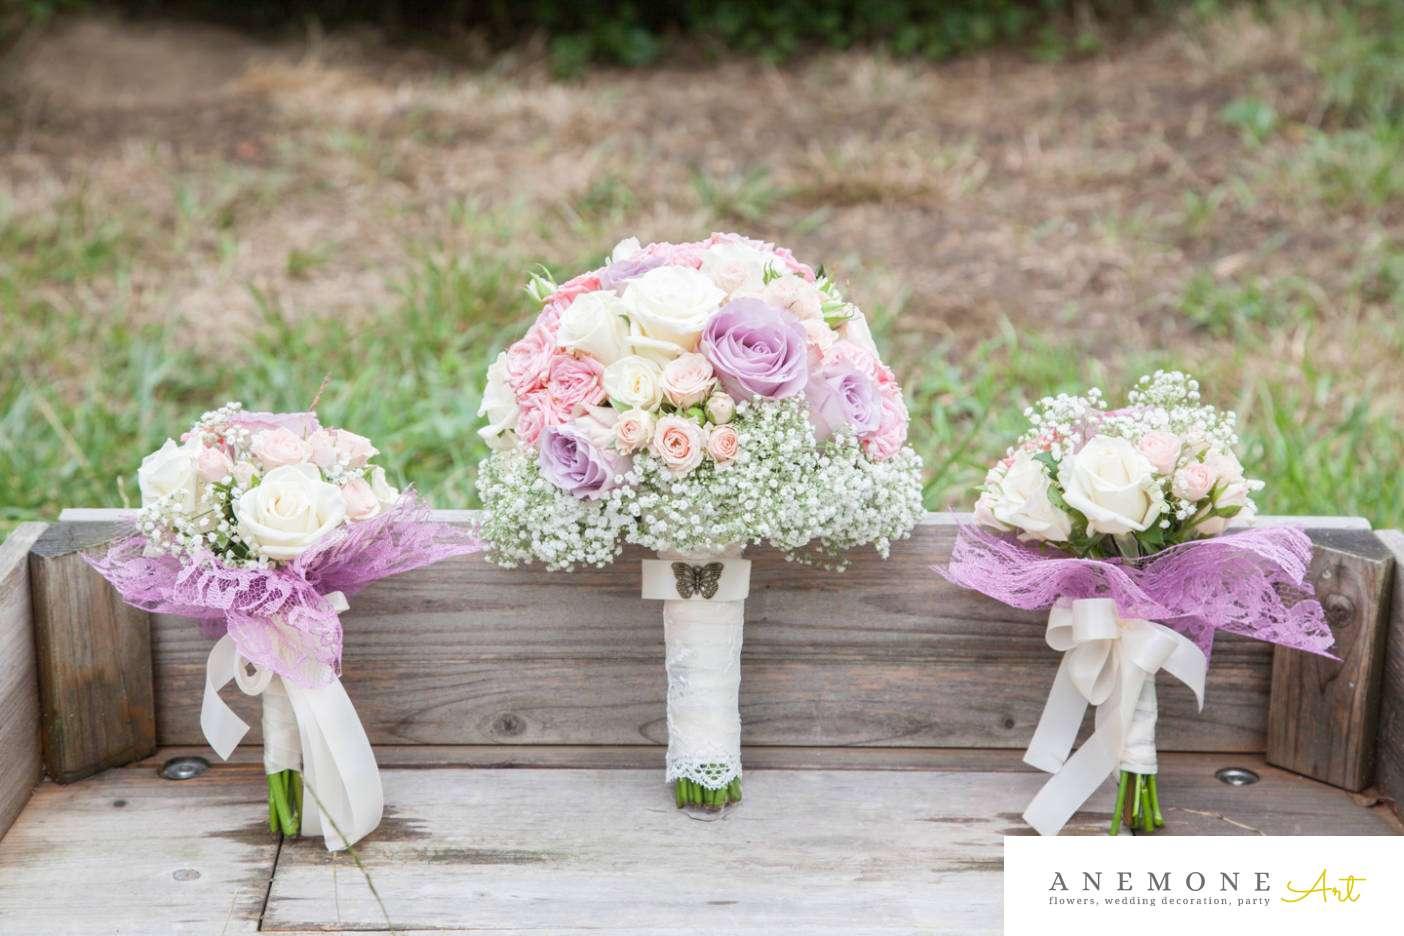 Poza, foto cu Flori de nunta buchet domnisoara, buchet mireasa, maner buchet in Arad, Timisoara, Oradea (wedding flowers, bouquets) nunta Arad, Timisoara, Oradea